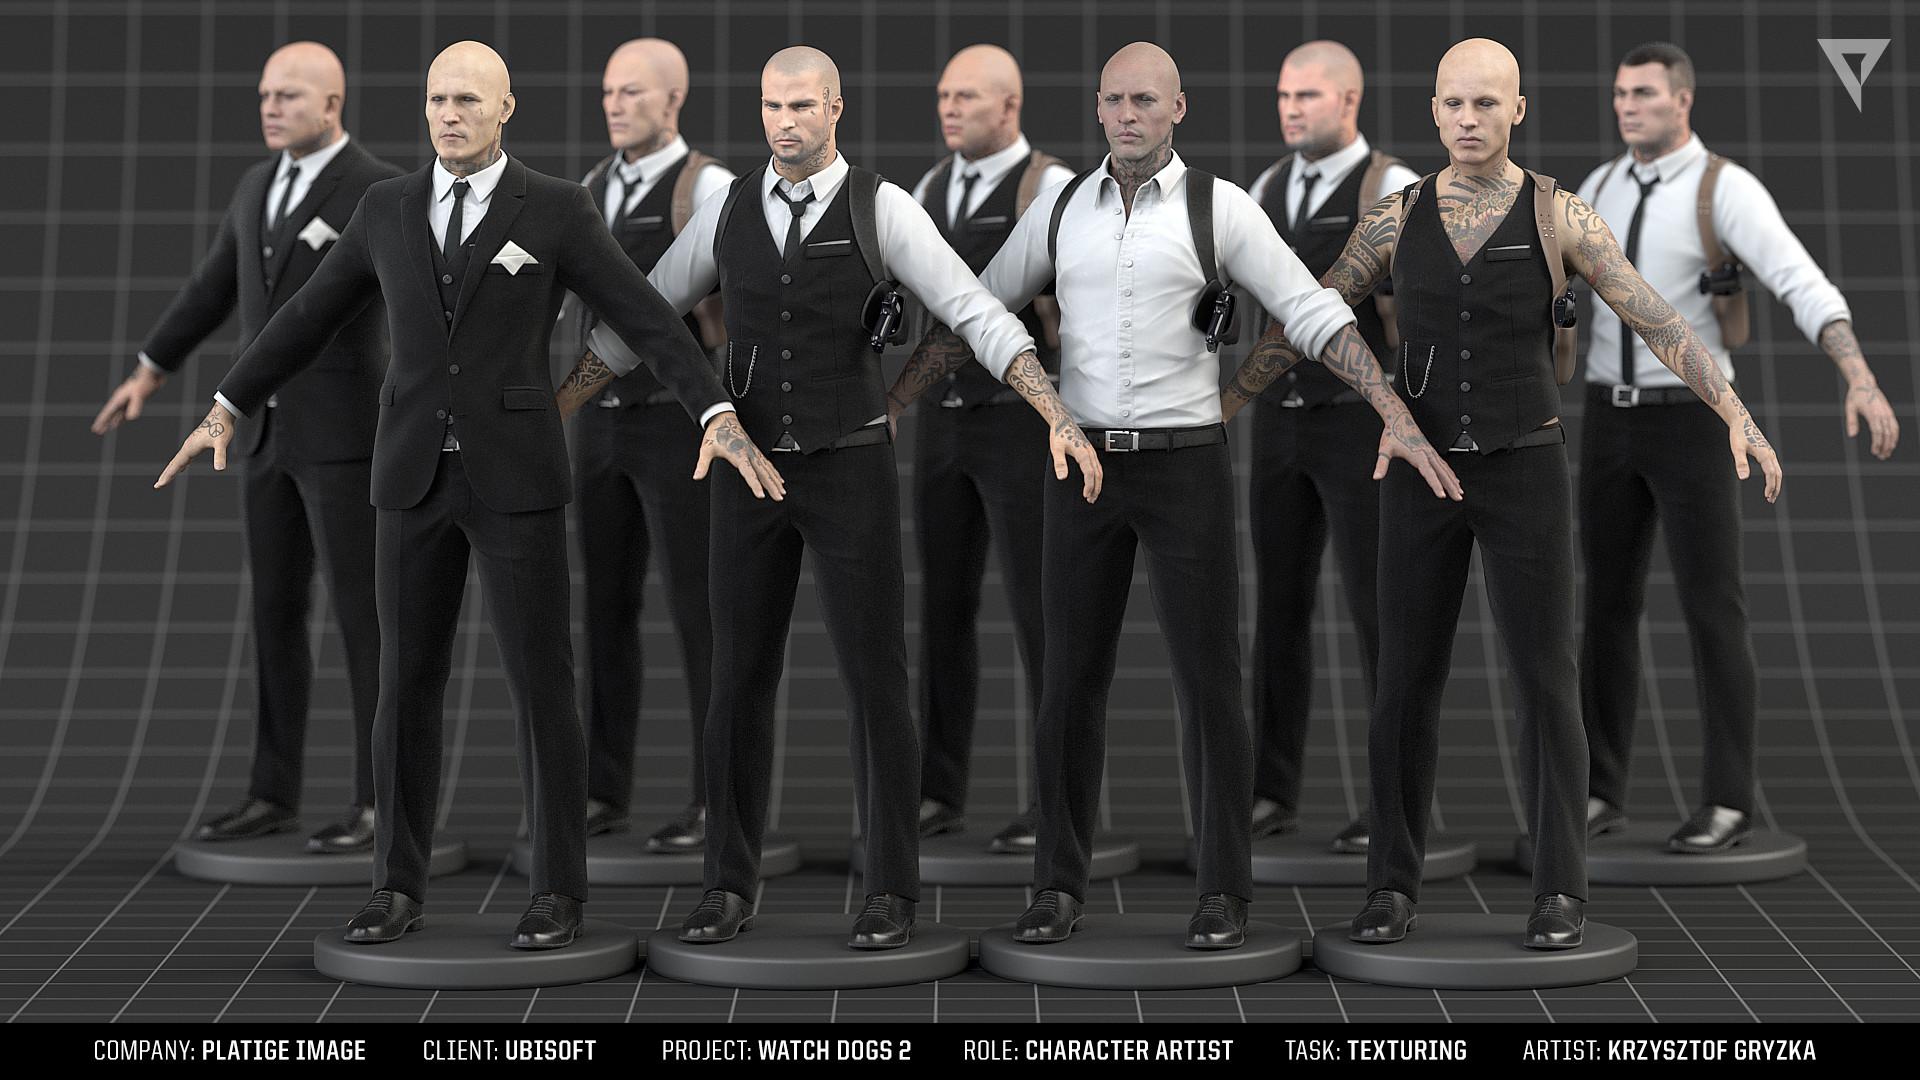 Krzysztof gryzka wd2 syndicate texturing2